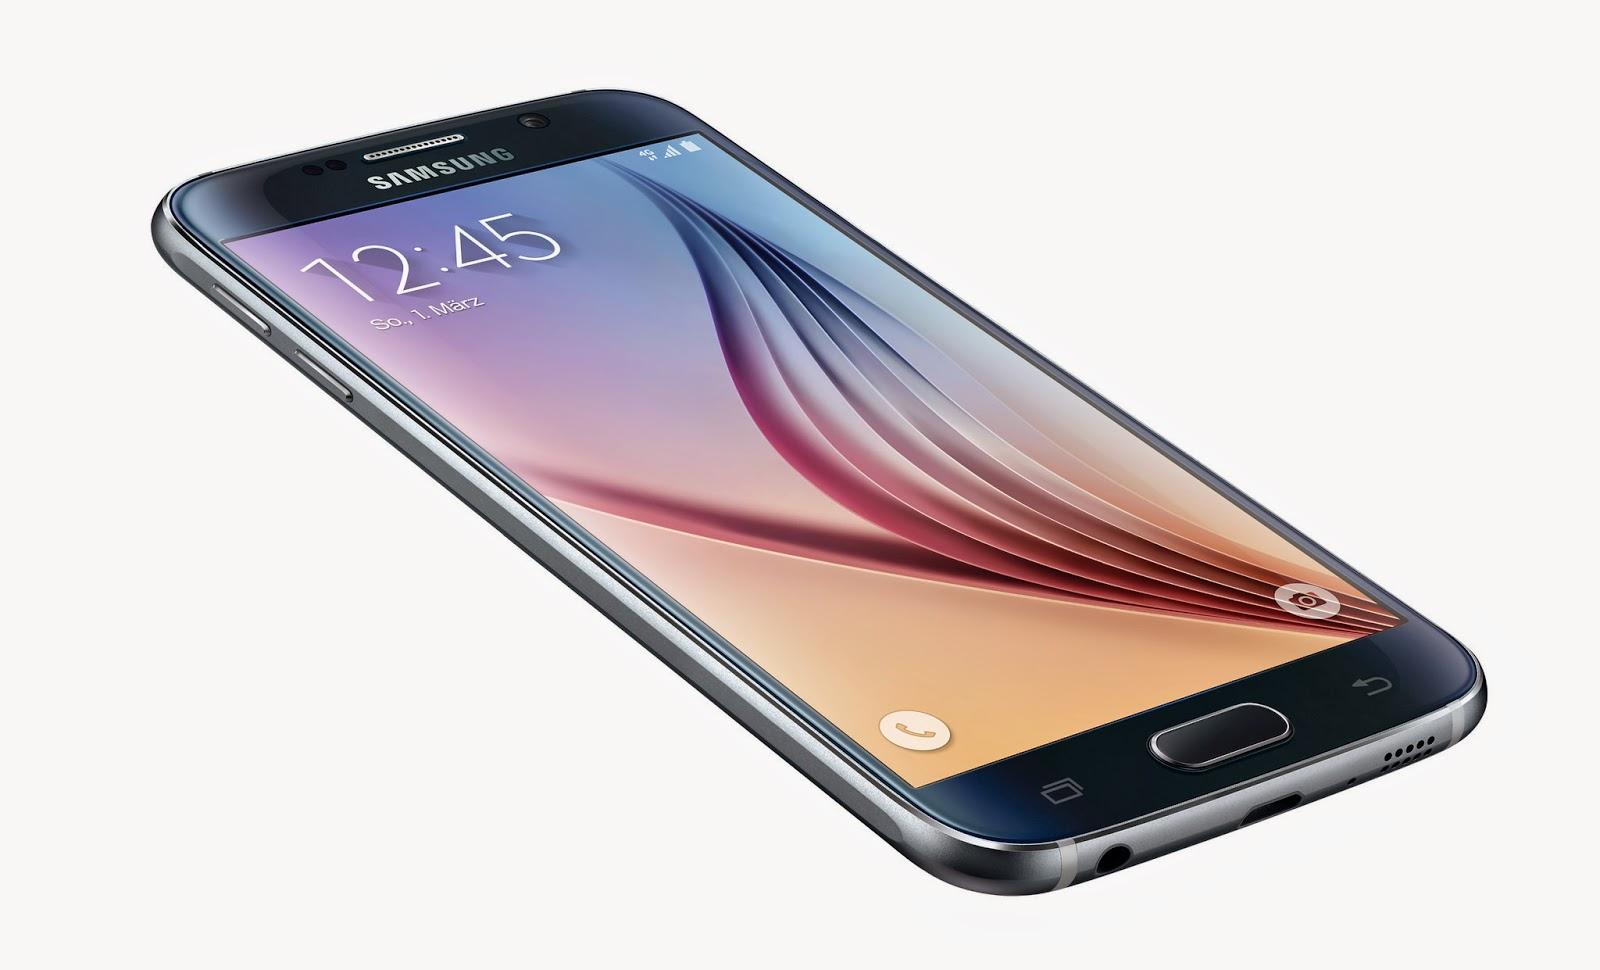 samsung galaxy S6 terbaru   harga dan spesifikasi